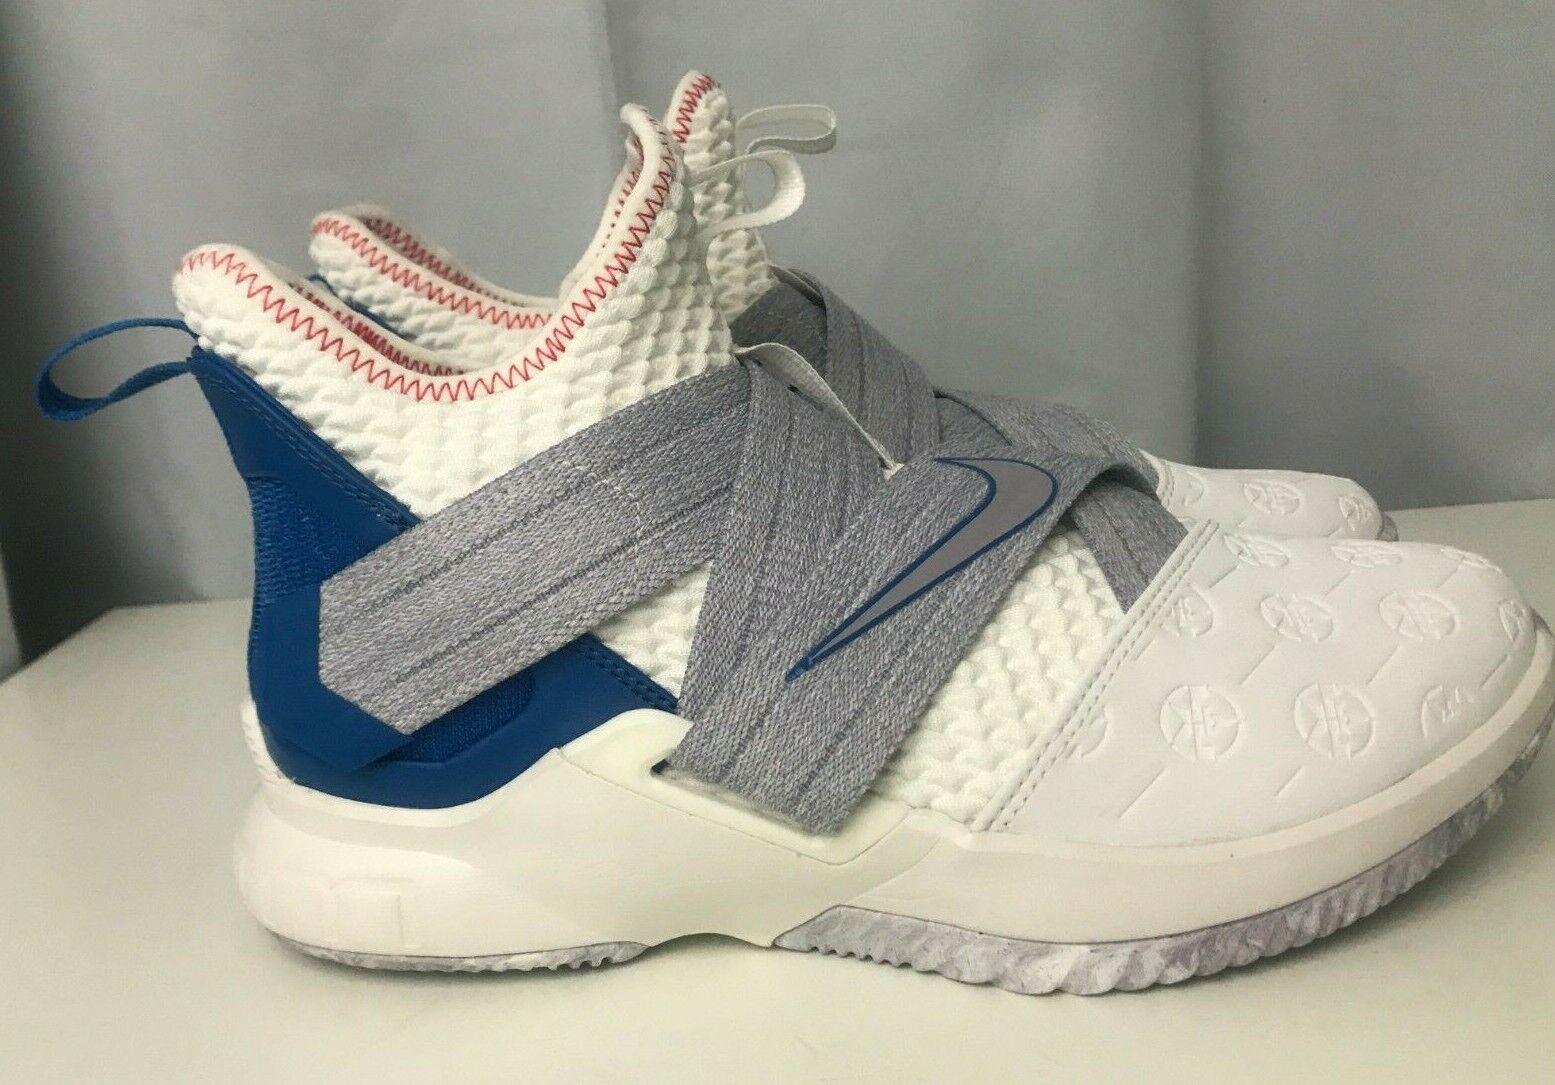 Nike LeBron Soldier 12 XII Basketball shoes Men's Sz 7 White (AO2609-101)